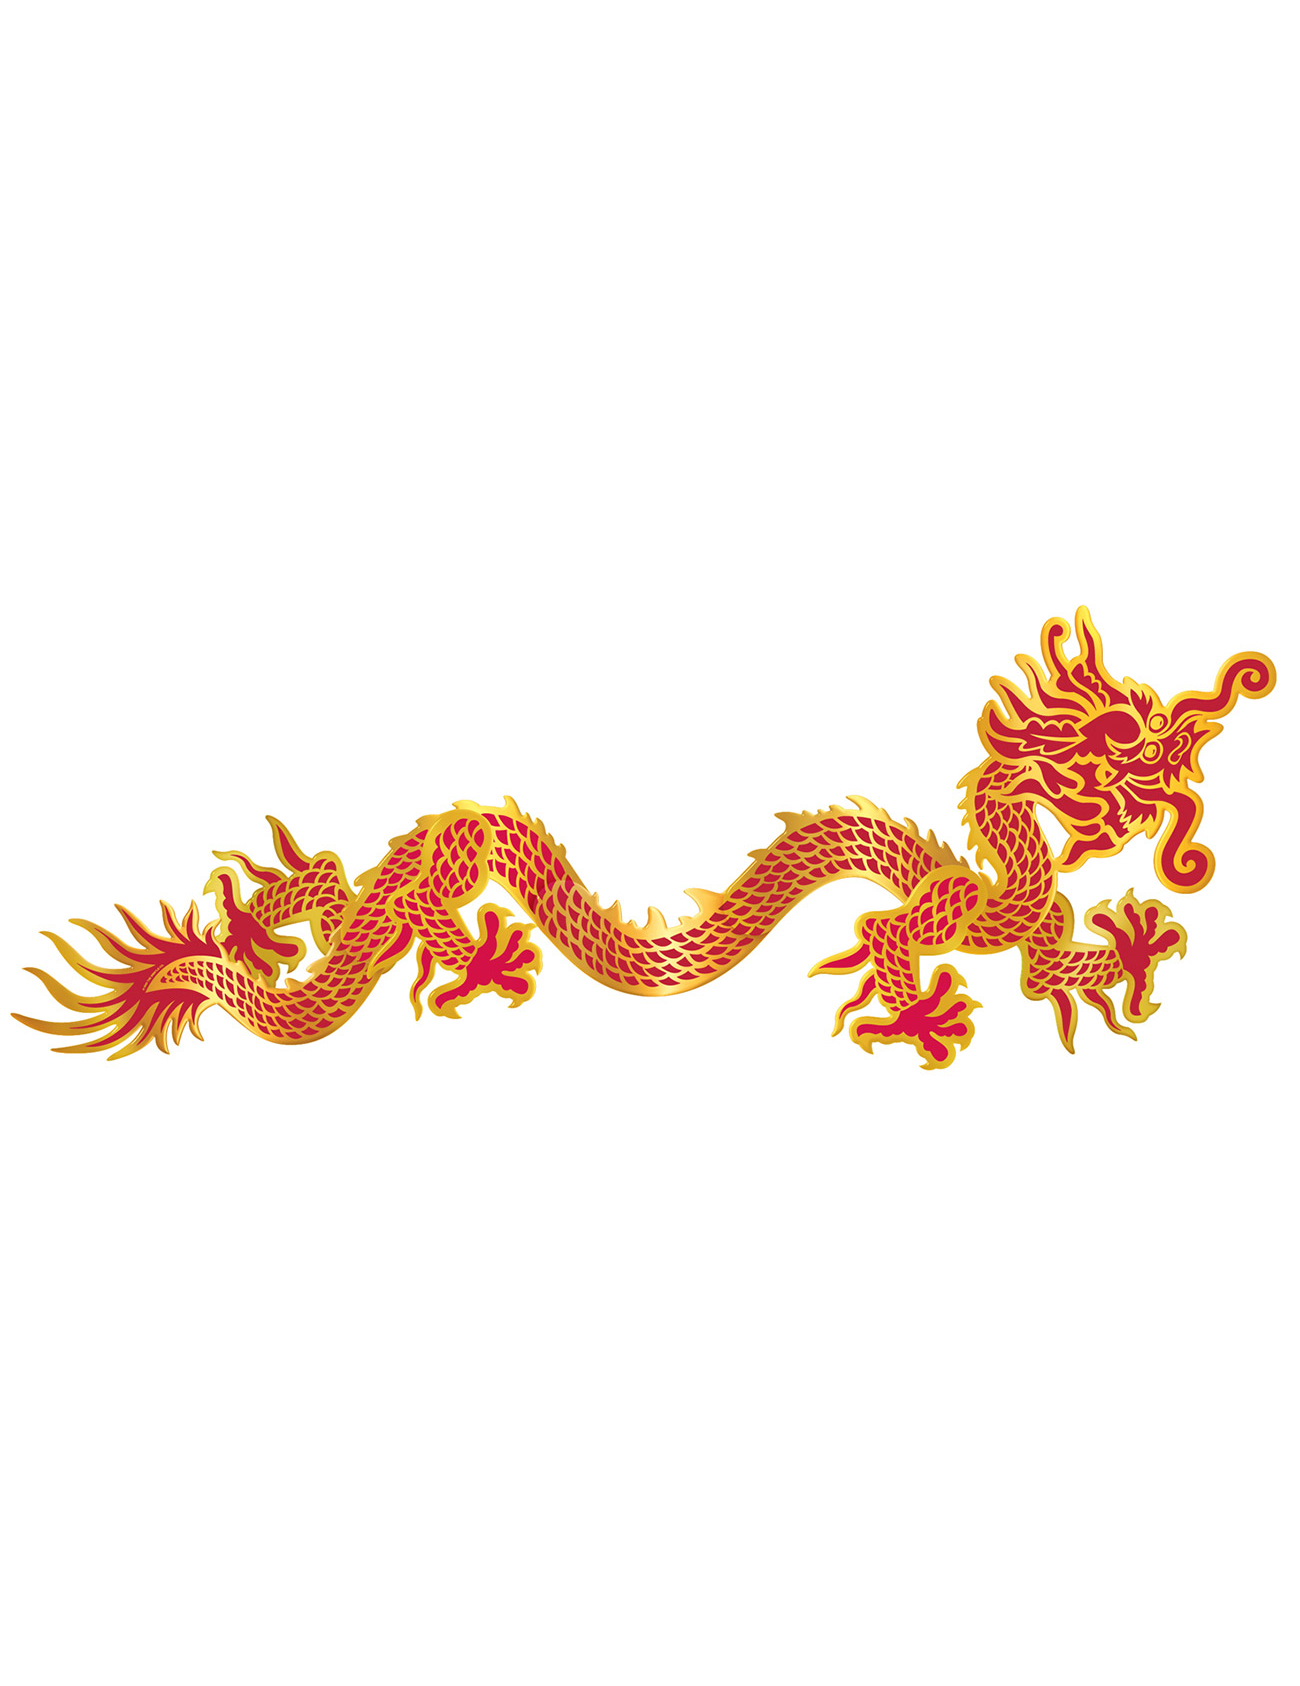 Objet Decoration Chinoise